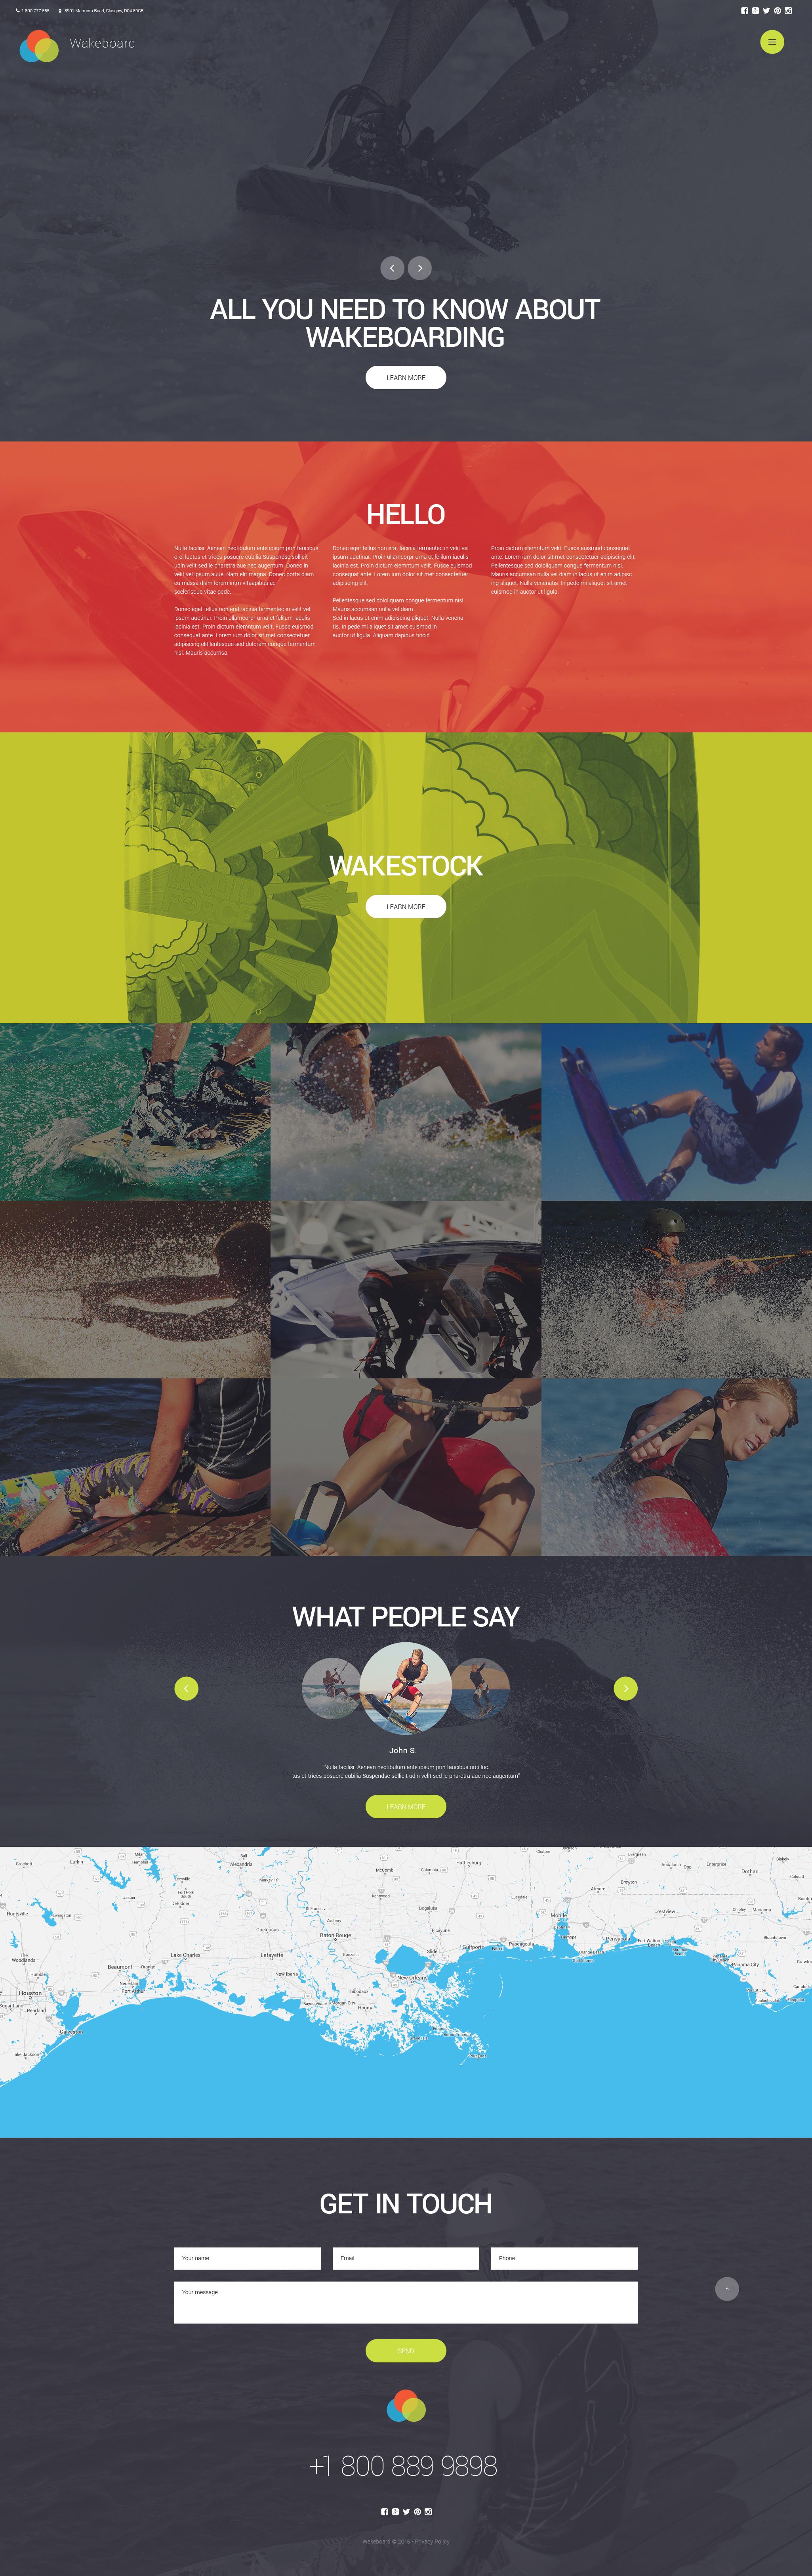 Wakeboarding Club №56072